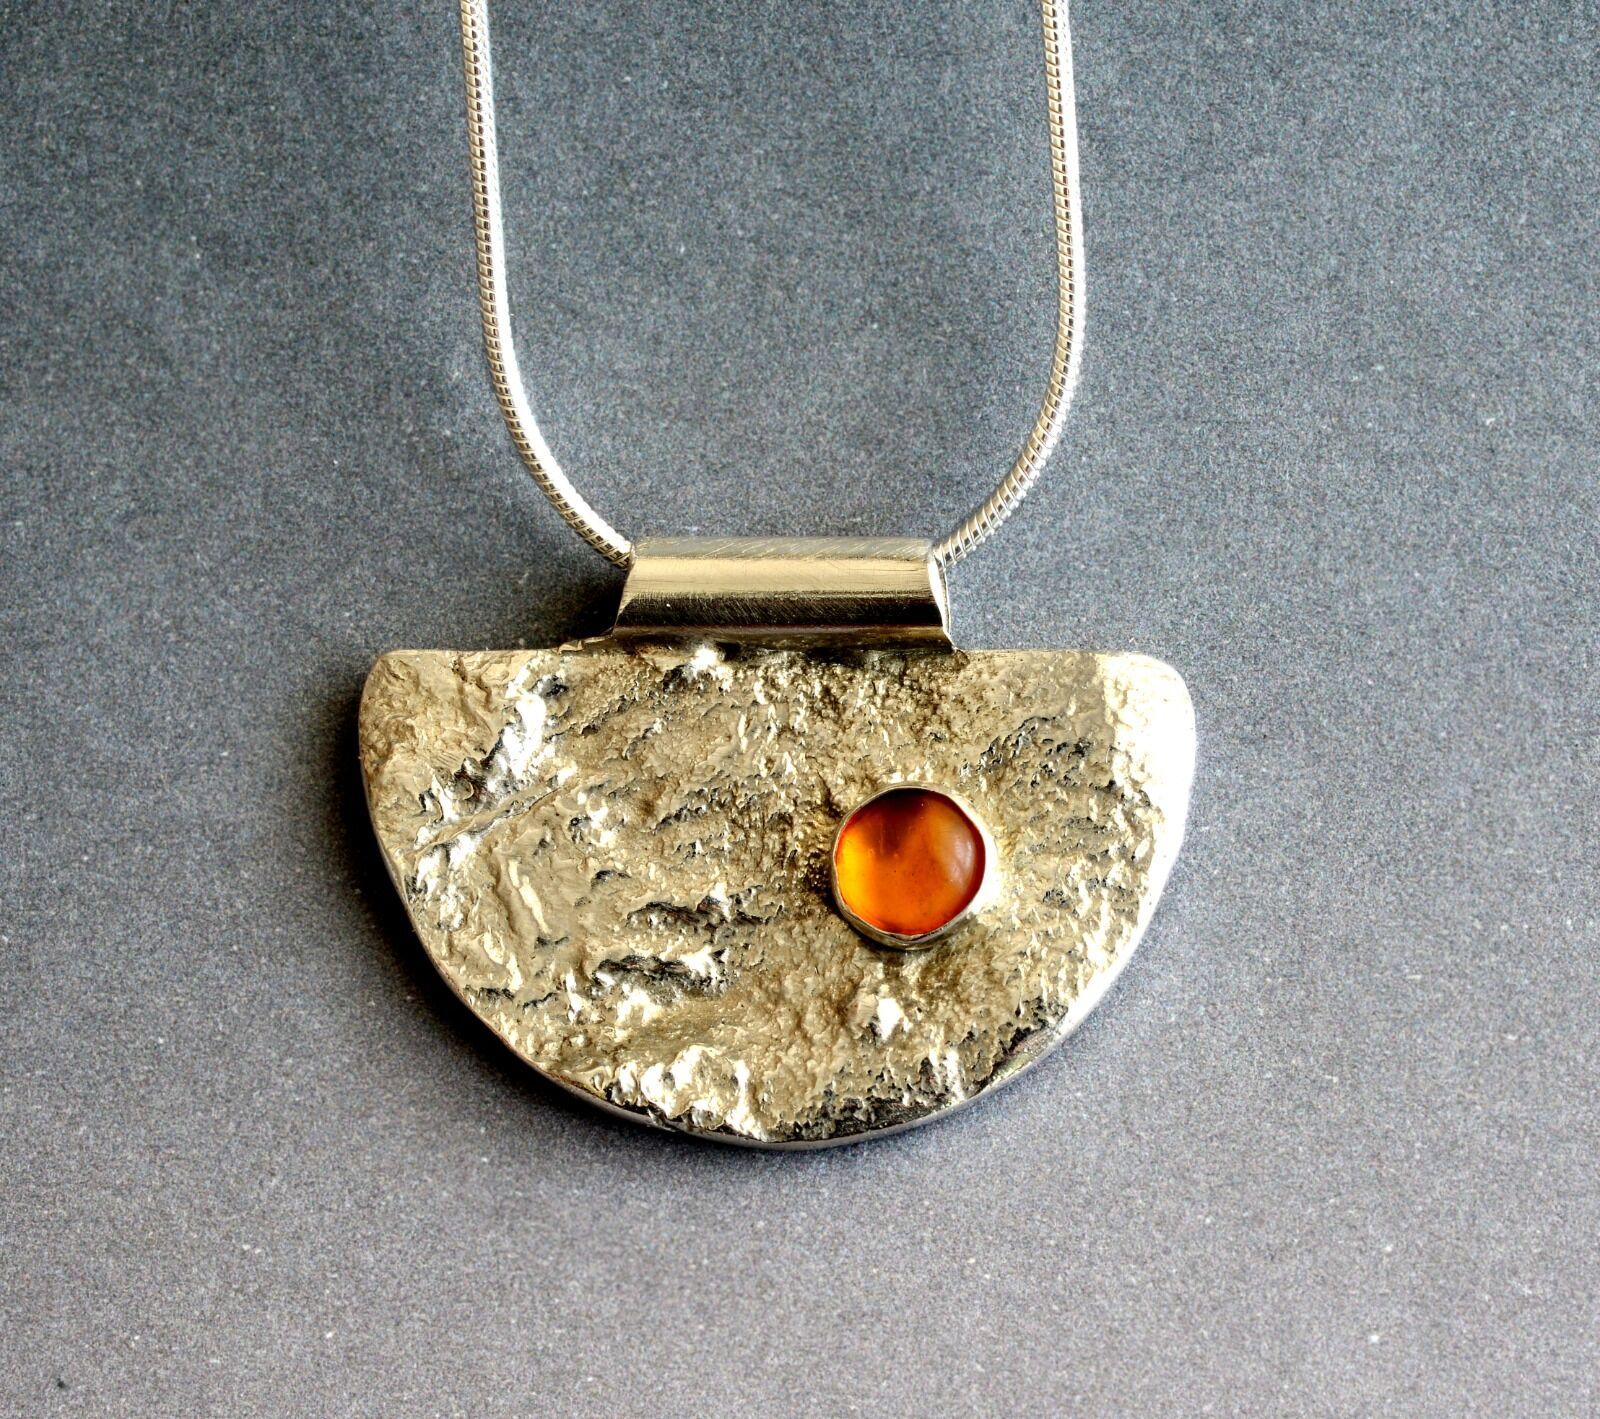 N18021 - Reticulated silver half moon pendant